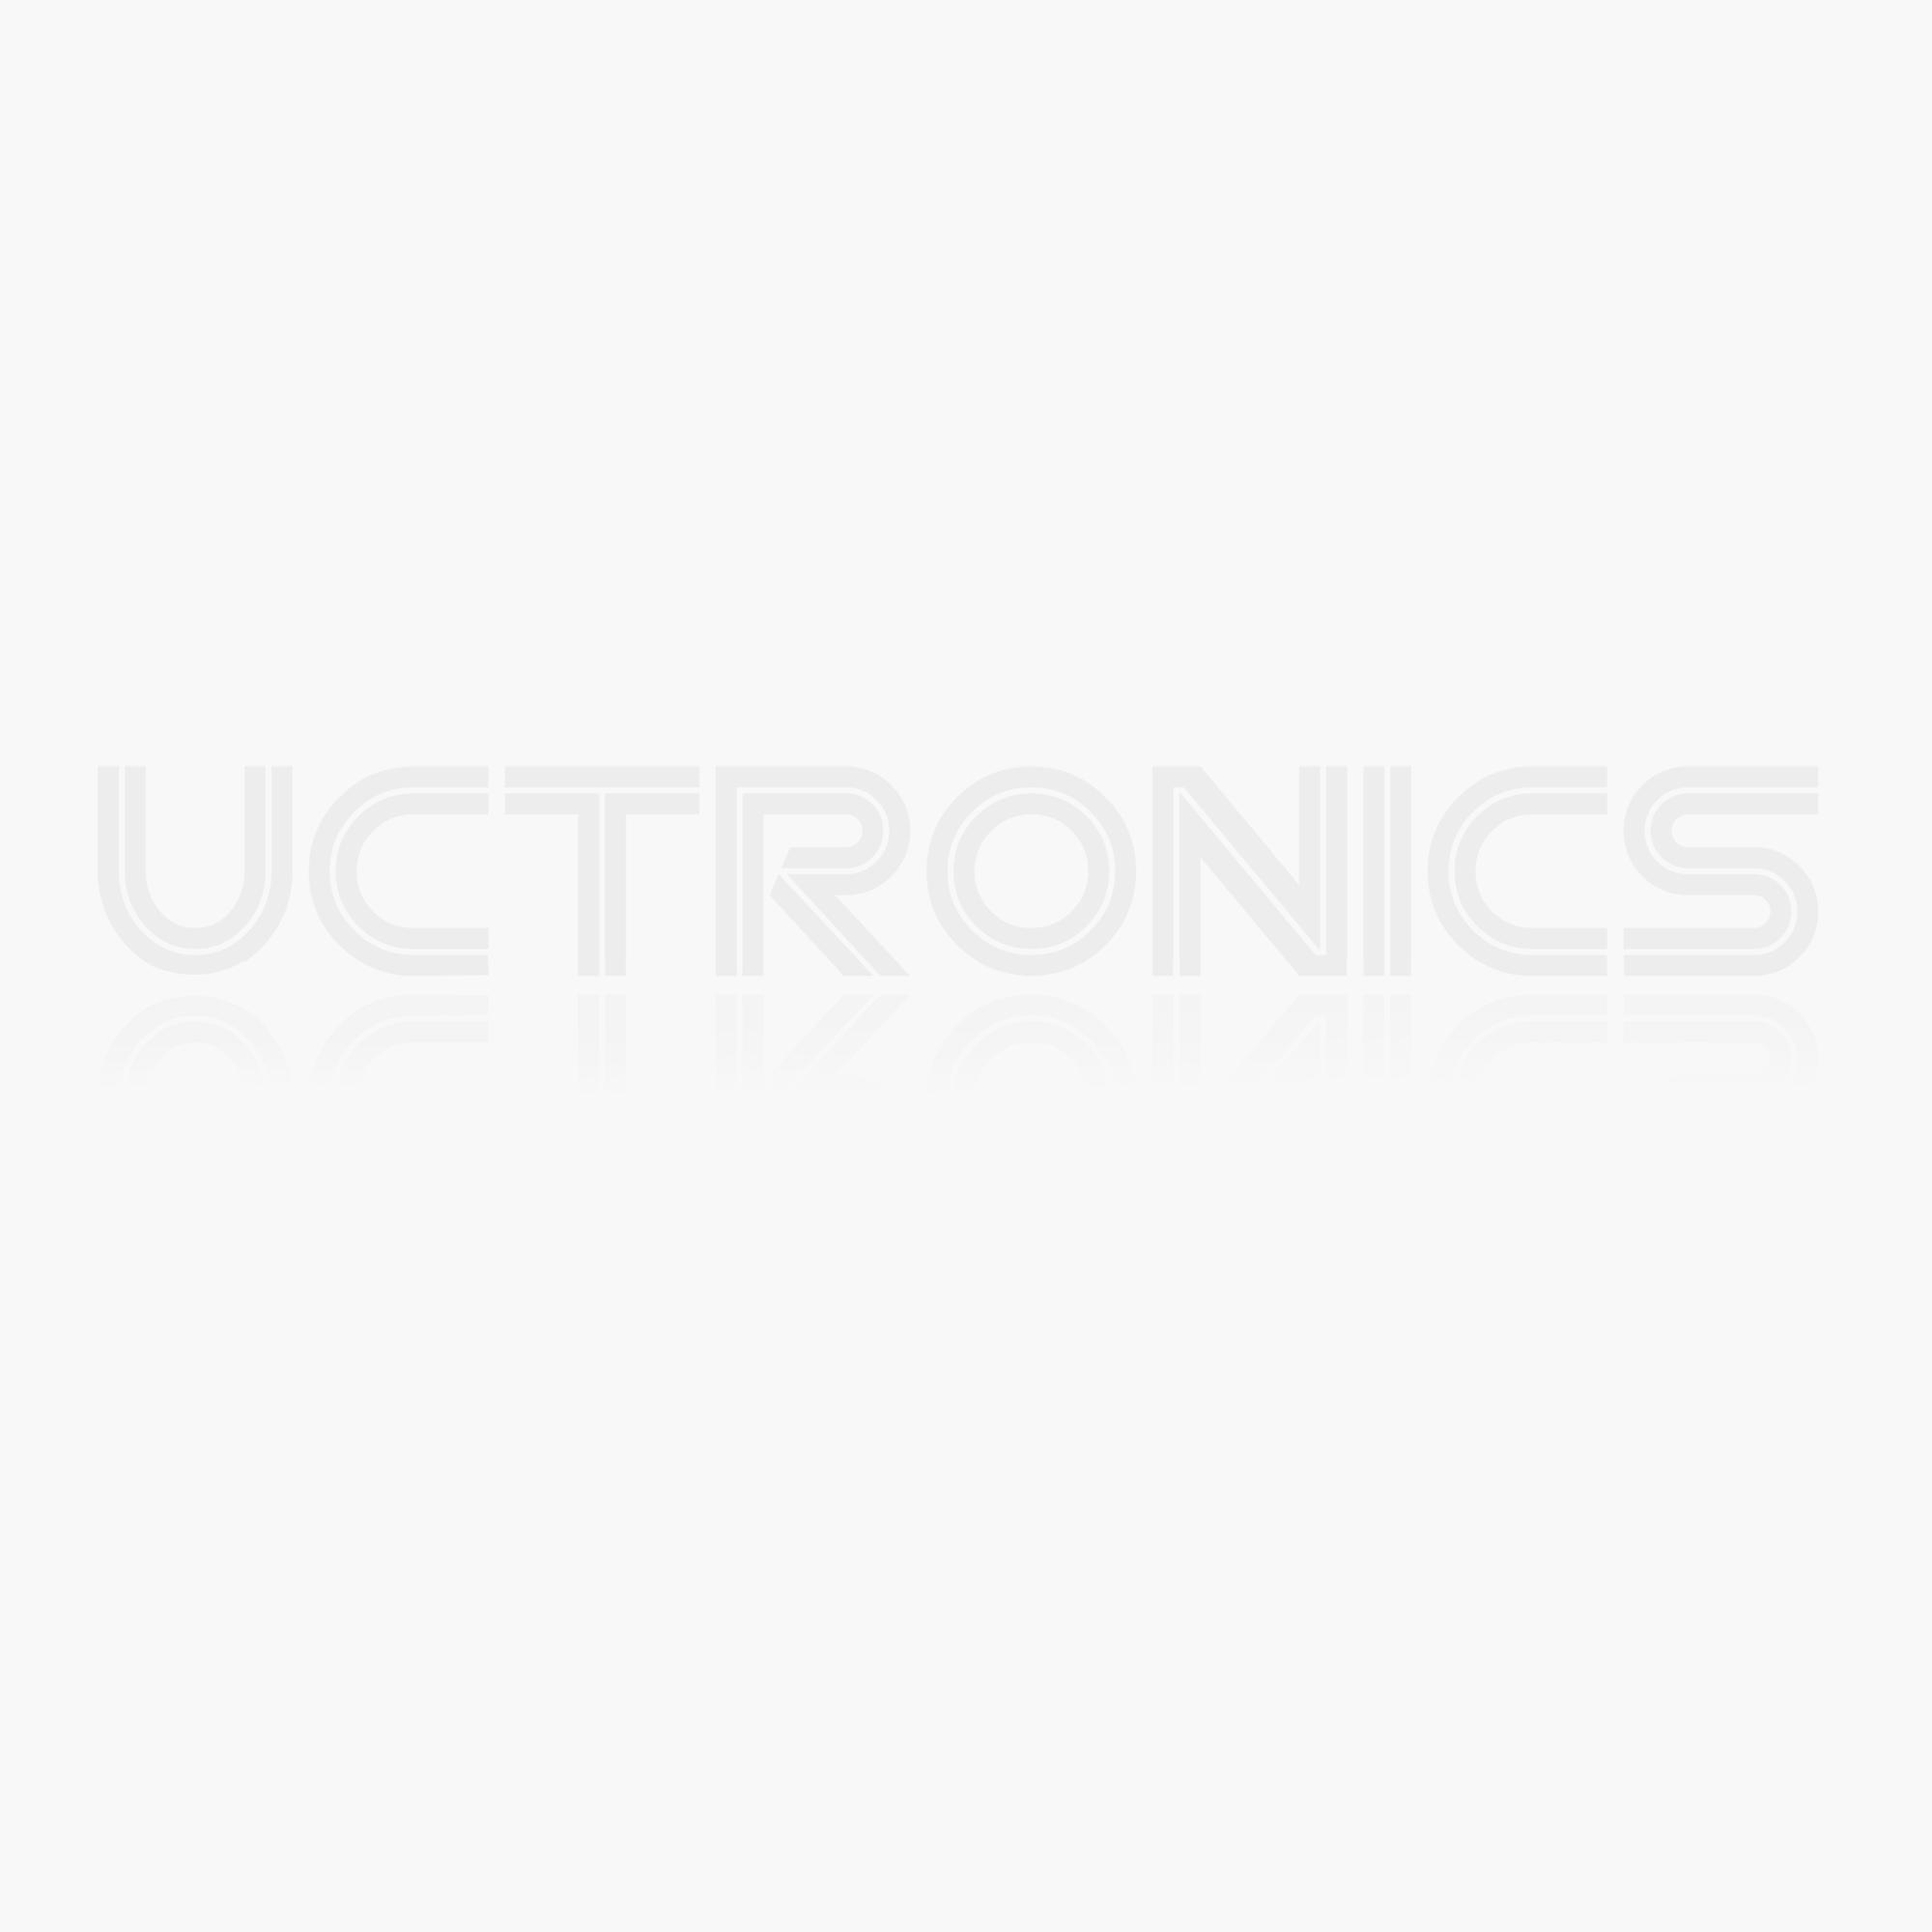 OV5647 NoIR Camera Board /w M12x0.5 mount for Raspberry Pi